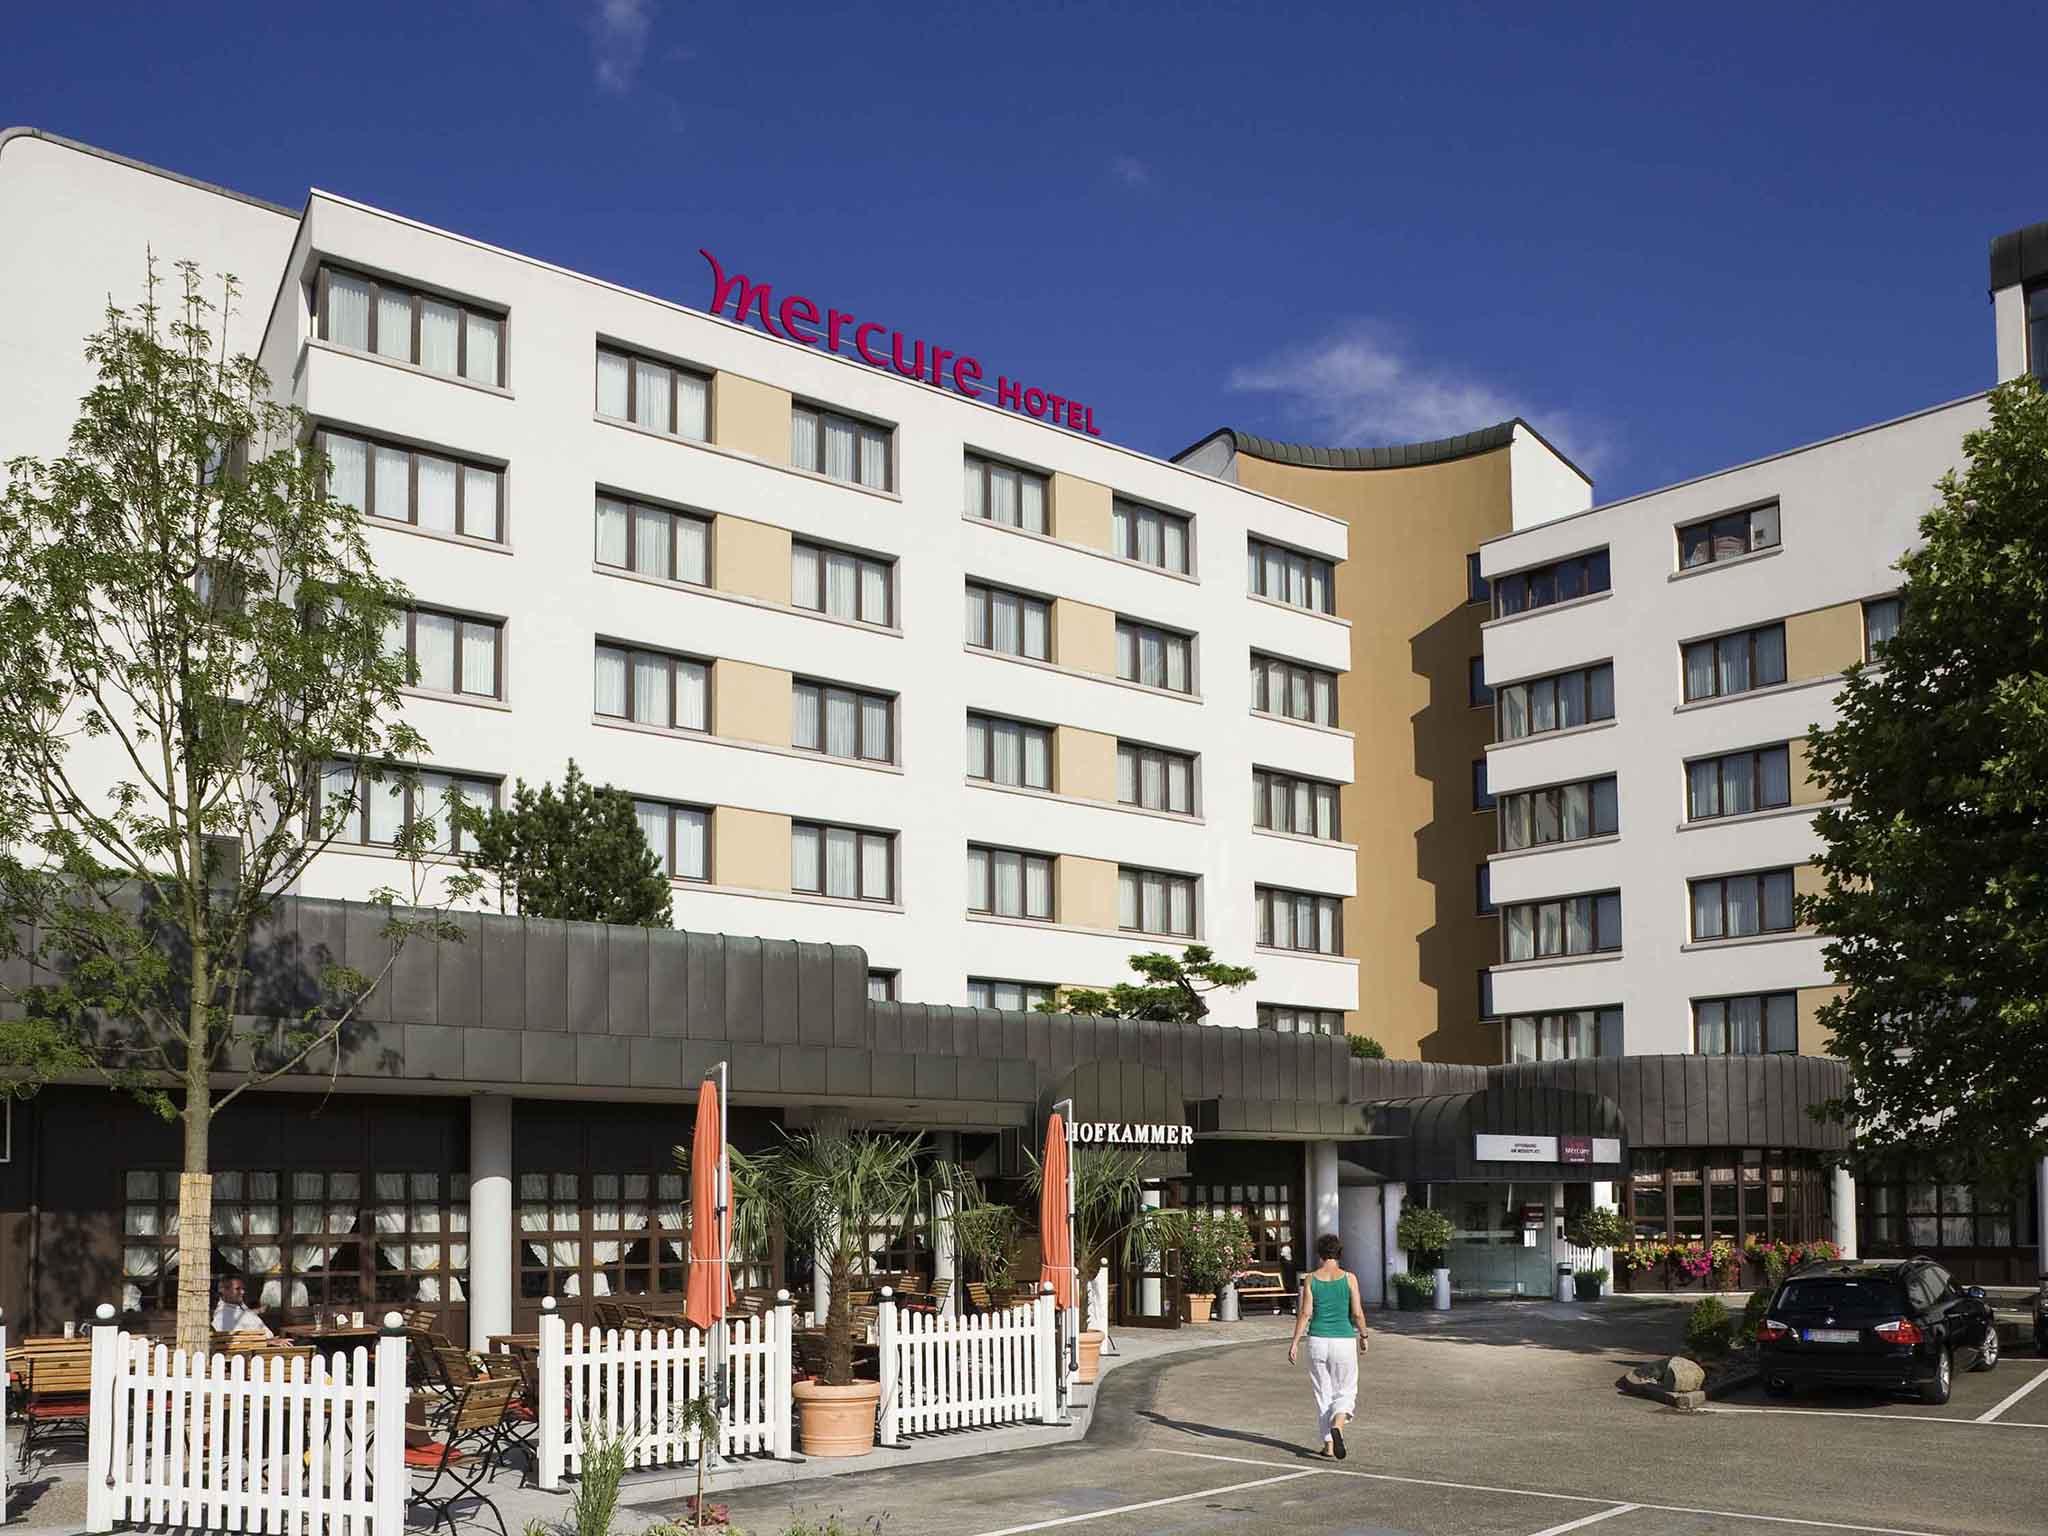 Hôtel 4 Étoiles Offenburg Messeplatz - Mercure - All avec Piscine Offenburg